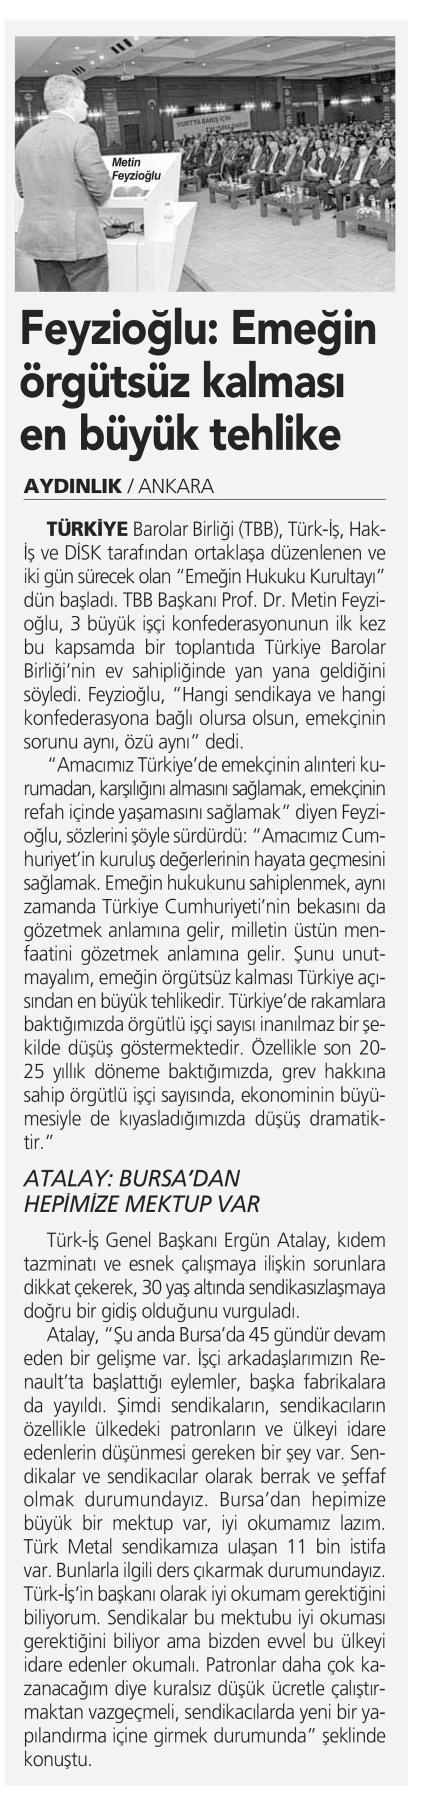 Ayd�nl�k Gazetesi, Feyzio�lu:Eme�in �rg�ts�z kalmas� en b�y�k tehlike